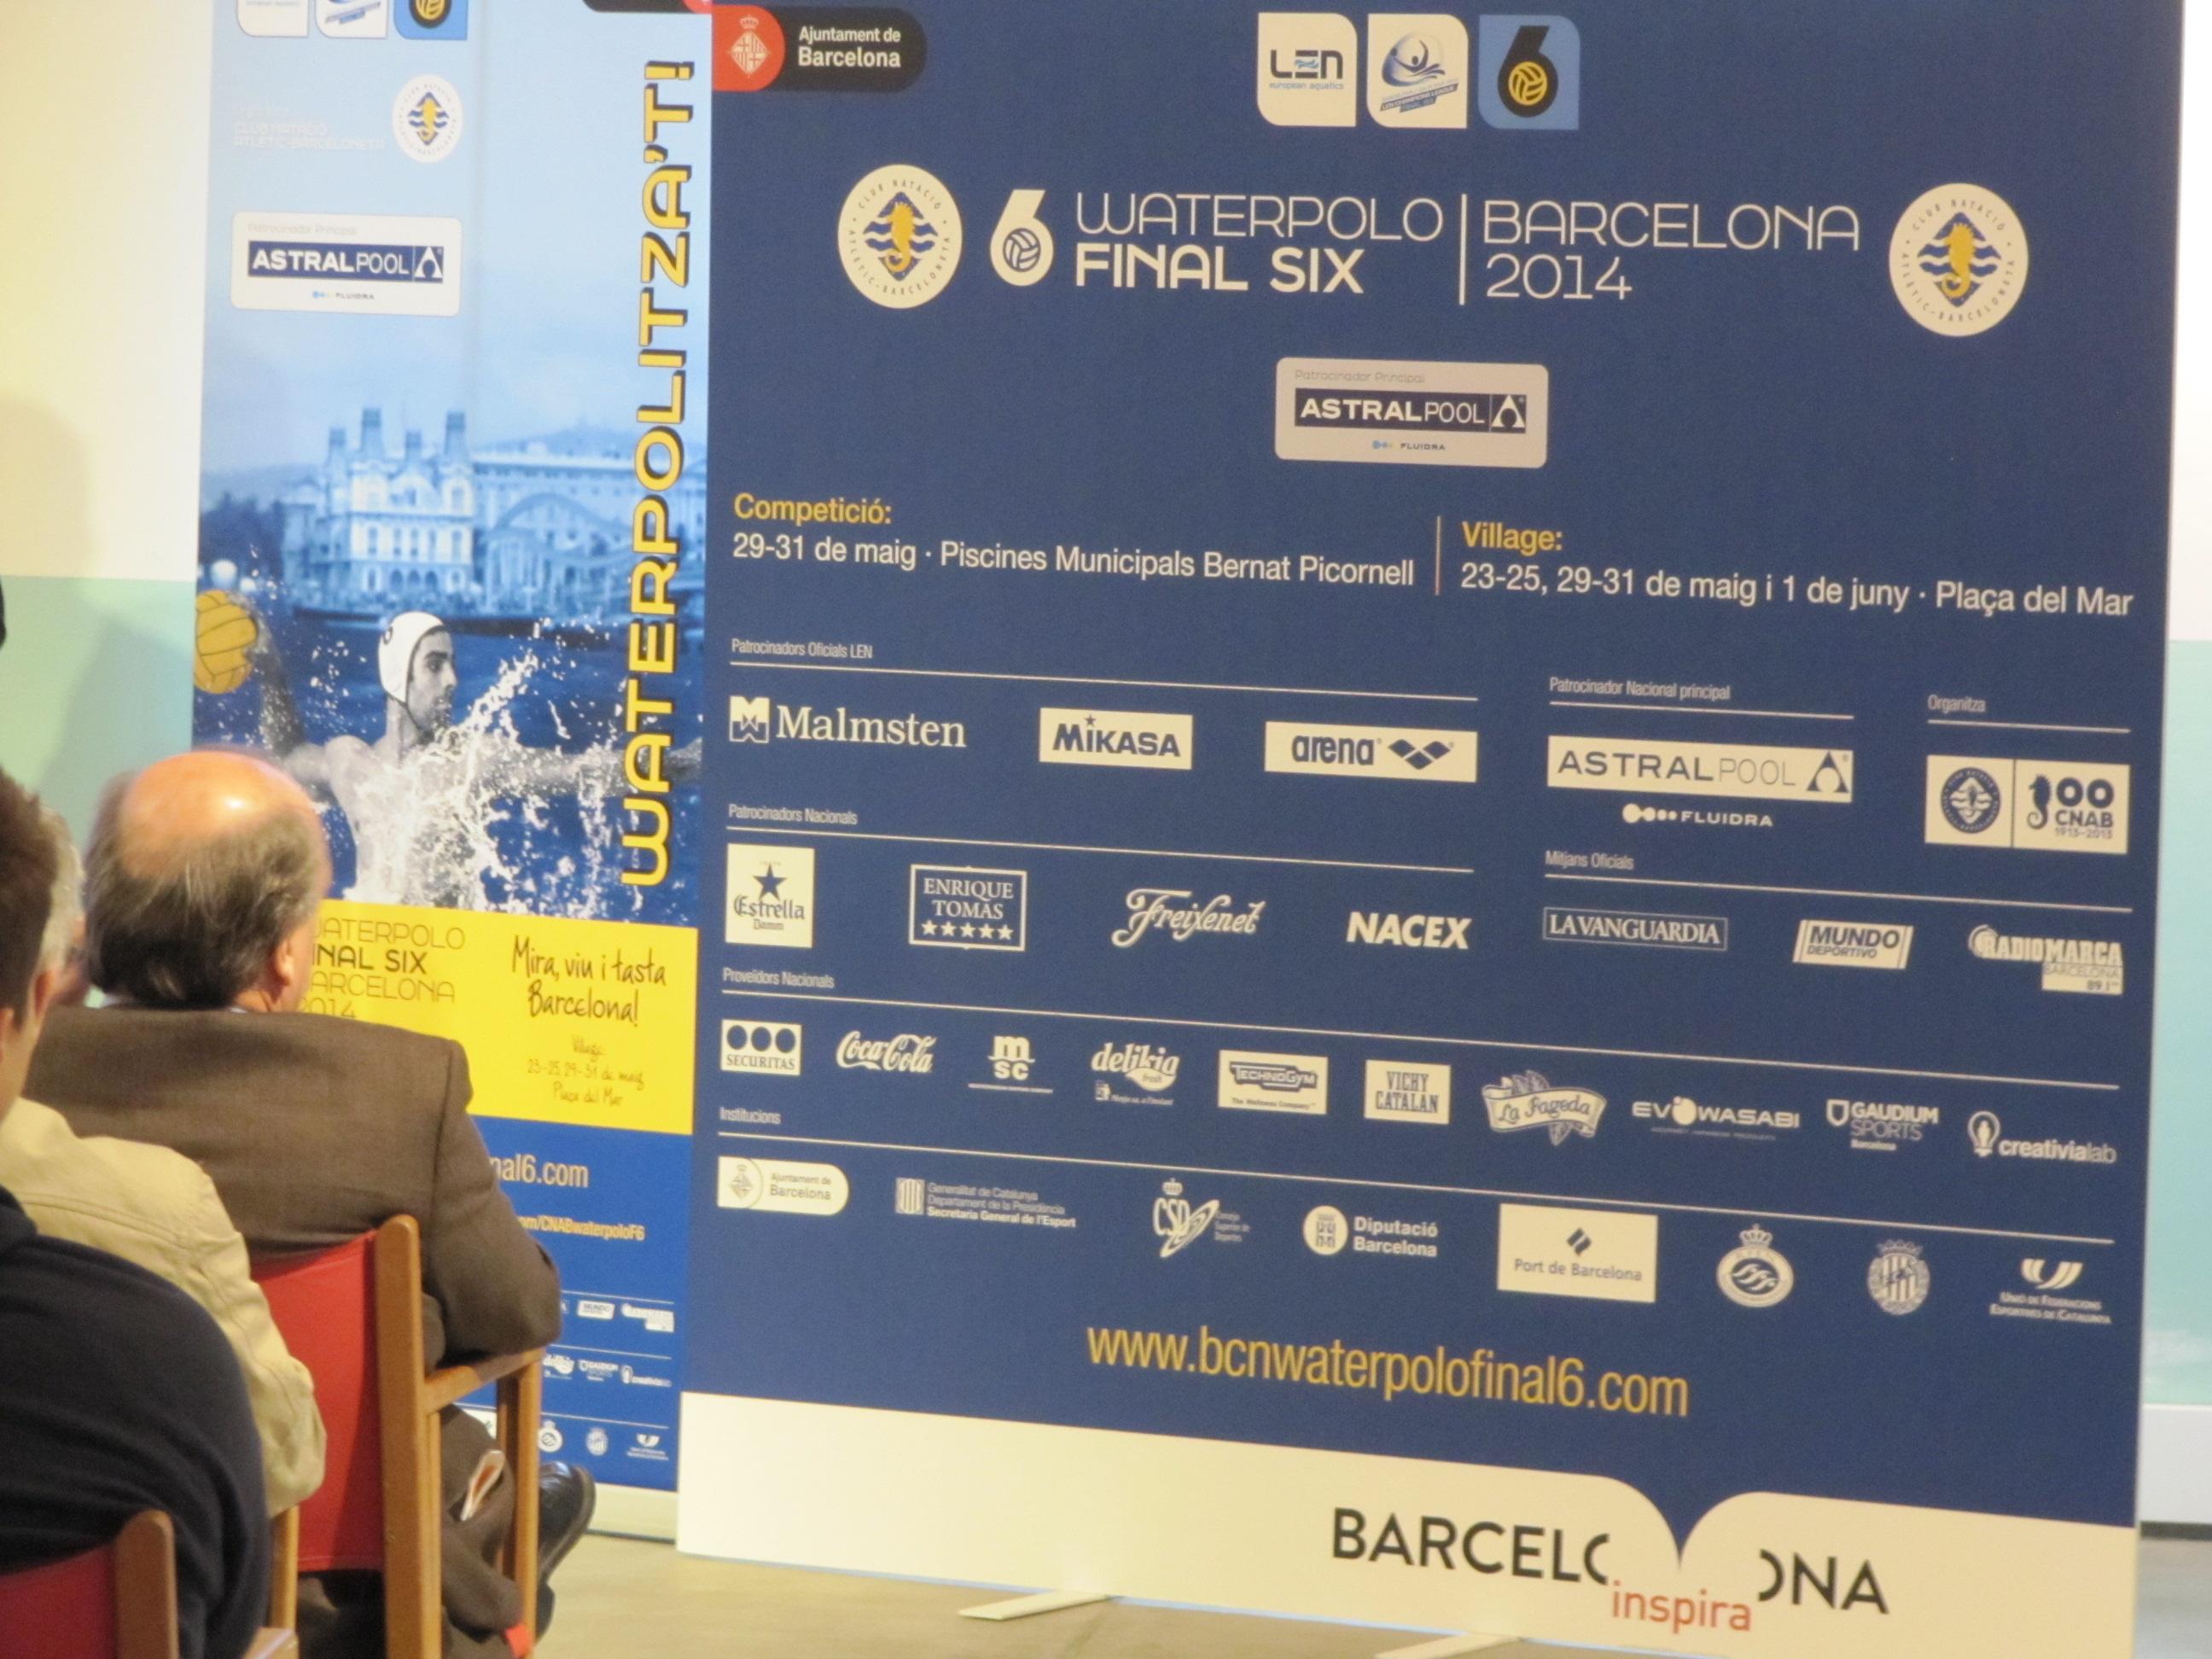 WATERPOLO FINAL SIX BARCELONA 2014_3